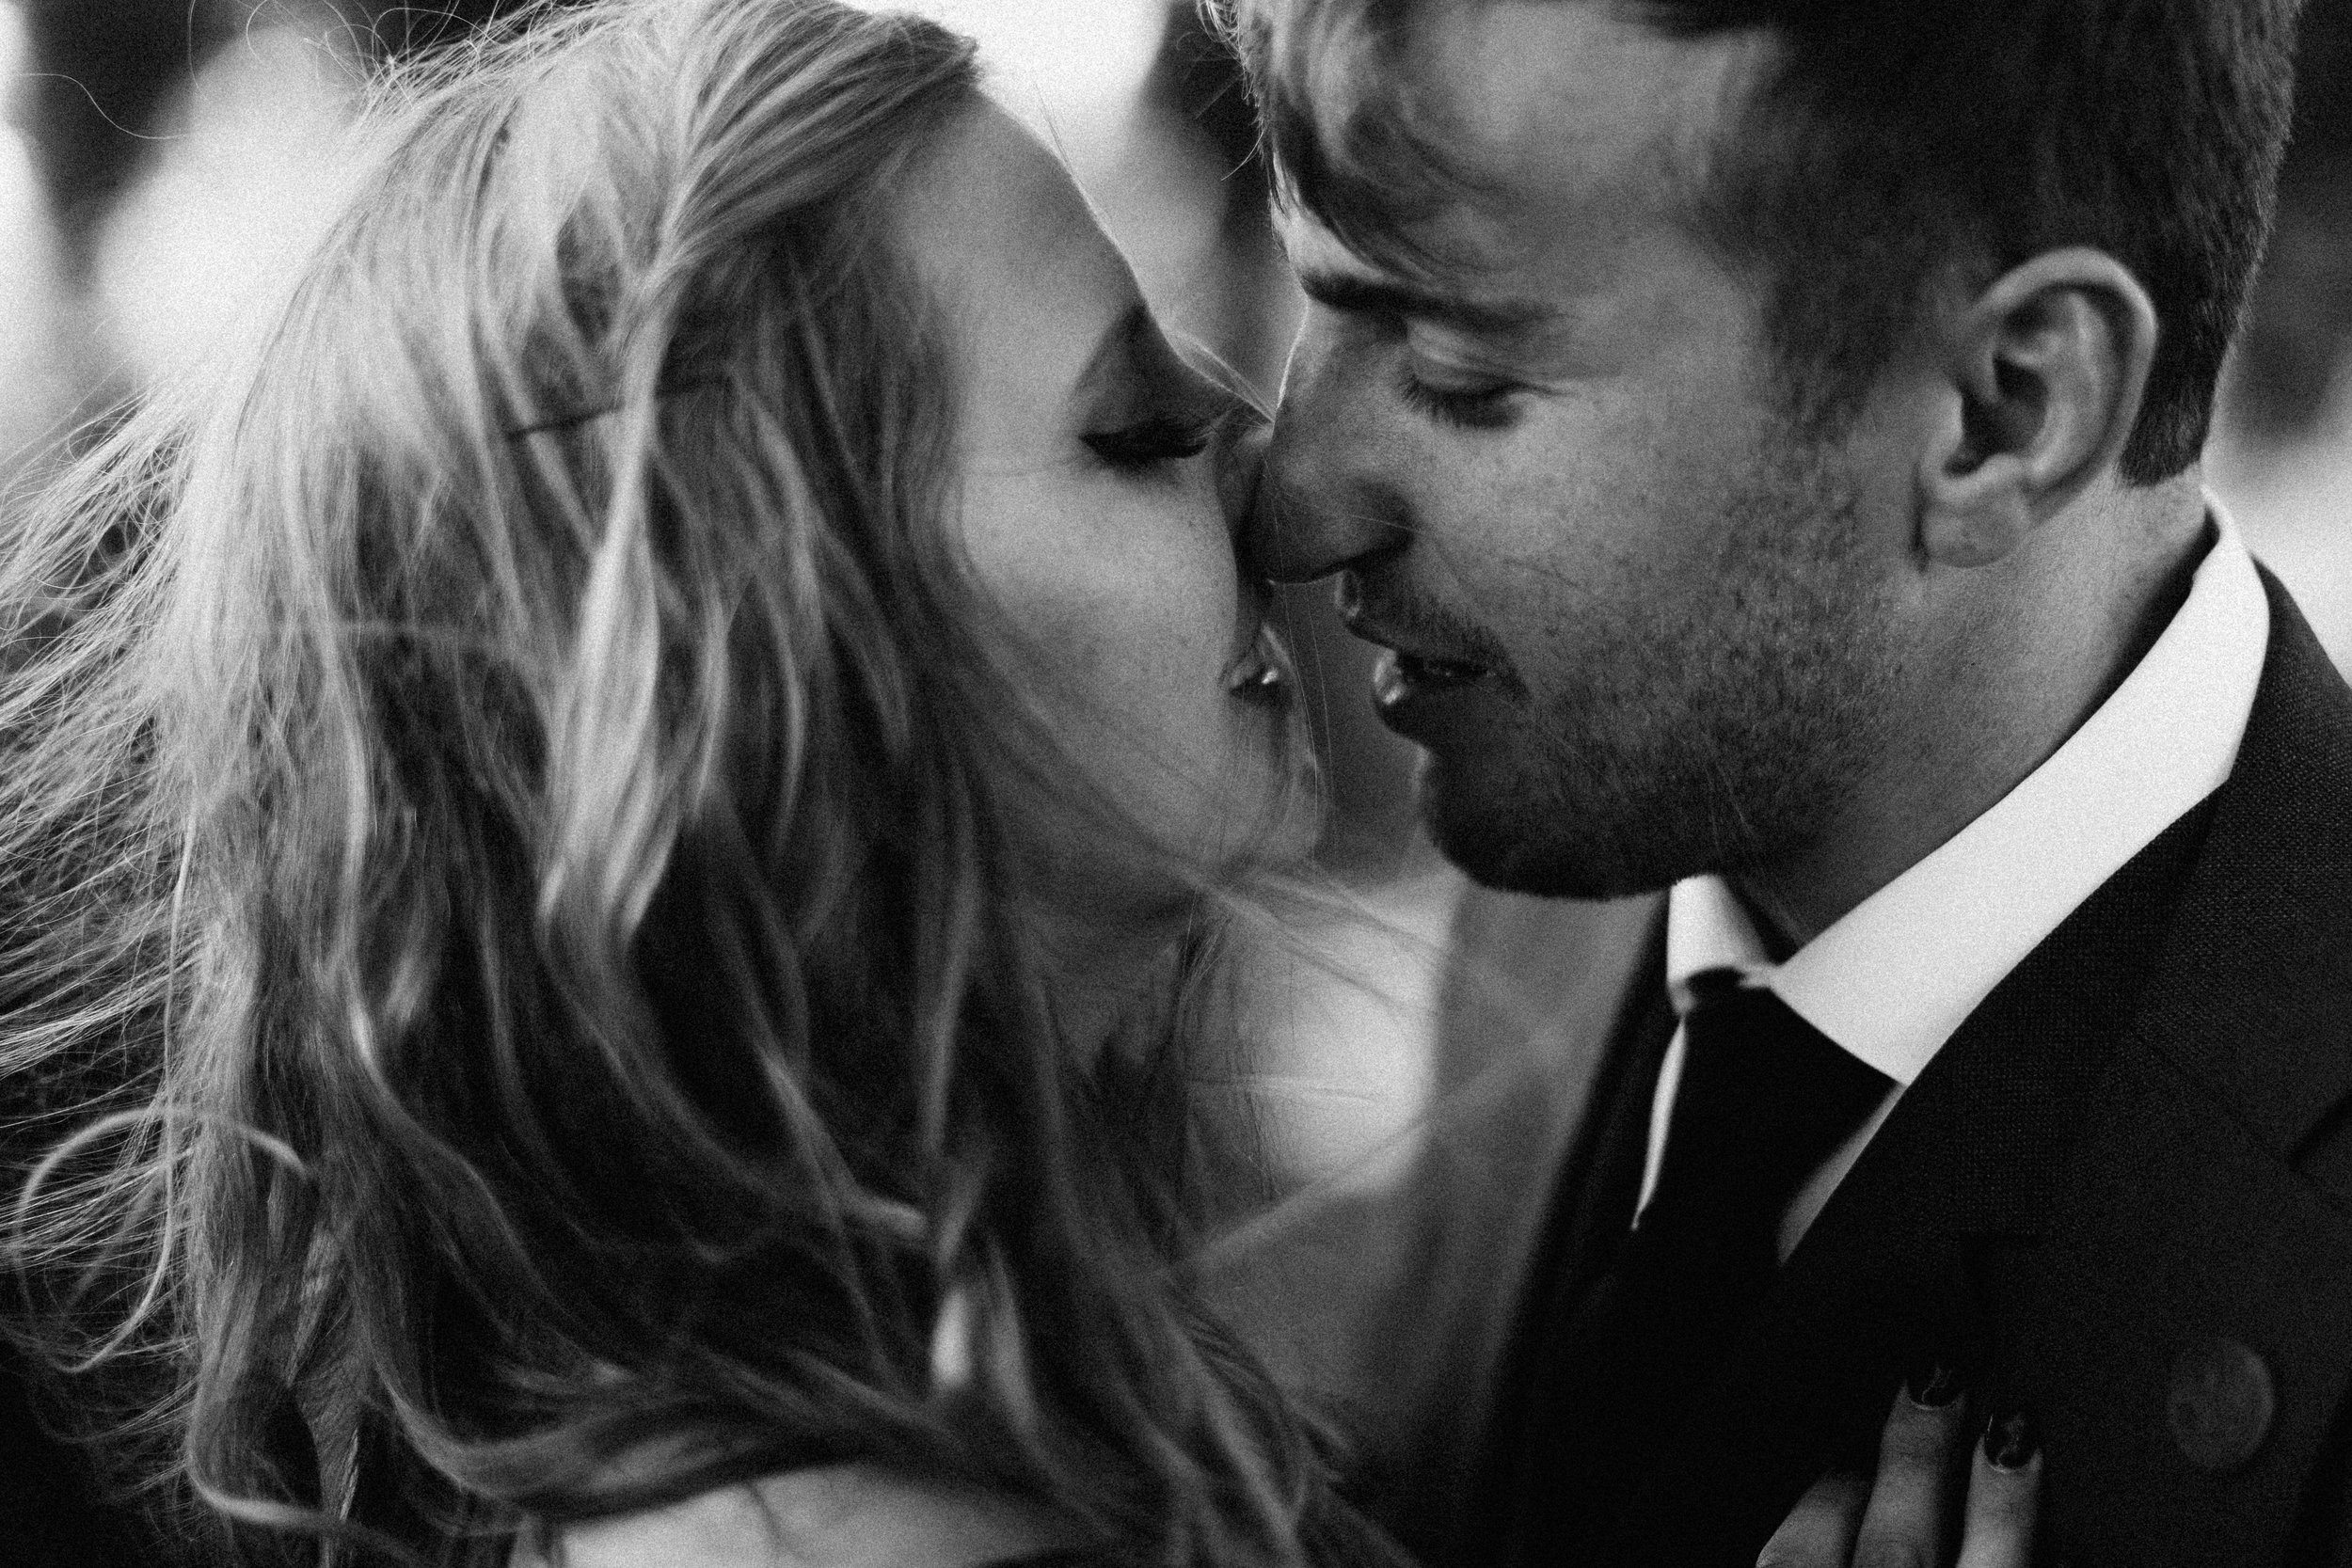 ireland_elopement_black_wedding_dress_wicklow_glendalough_athy_st_kevins_way_1714.jpg